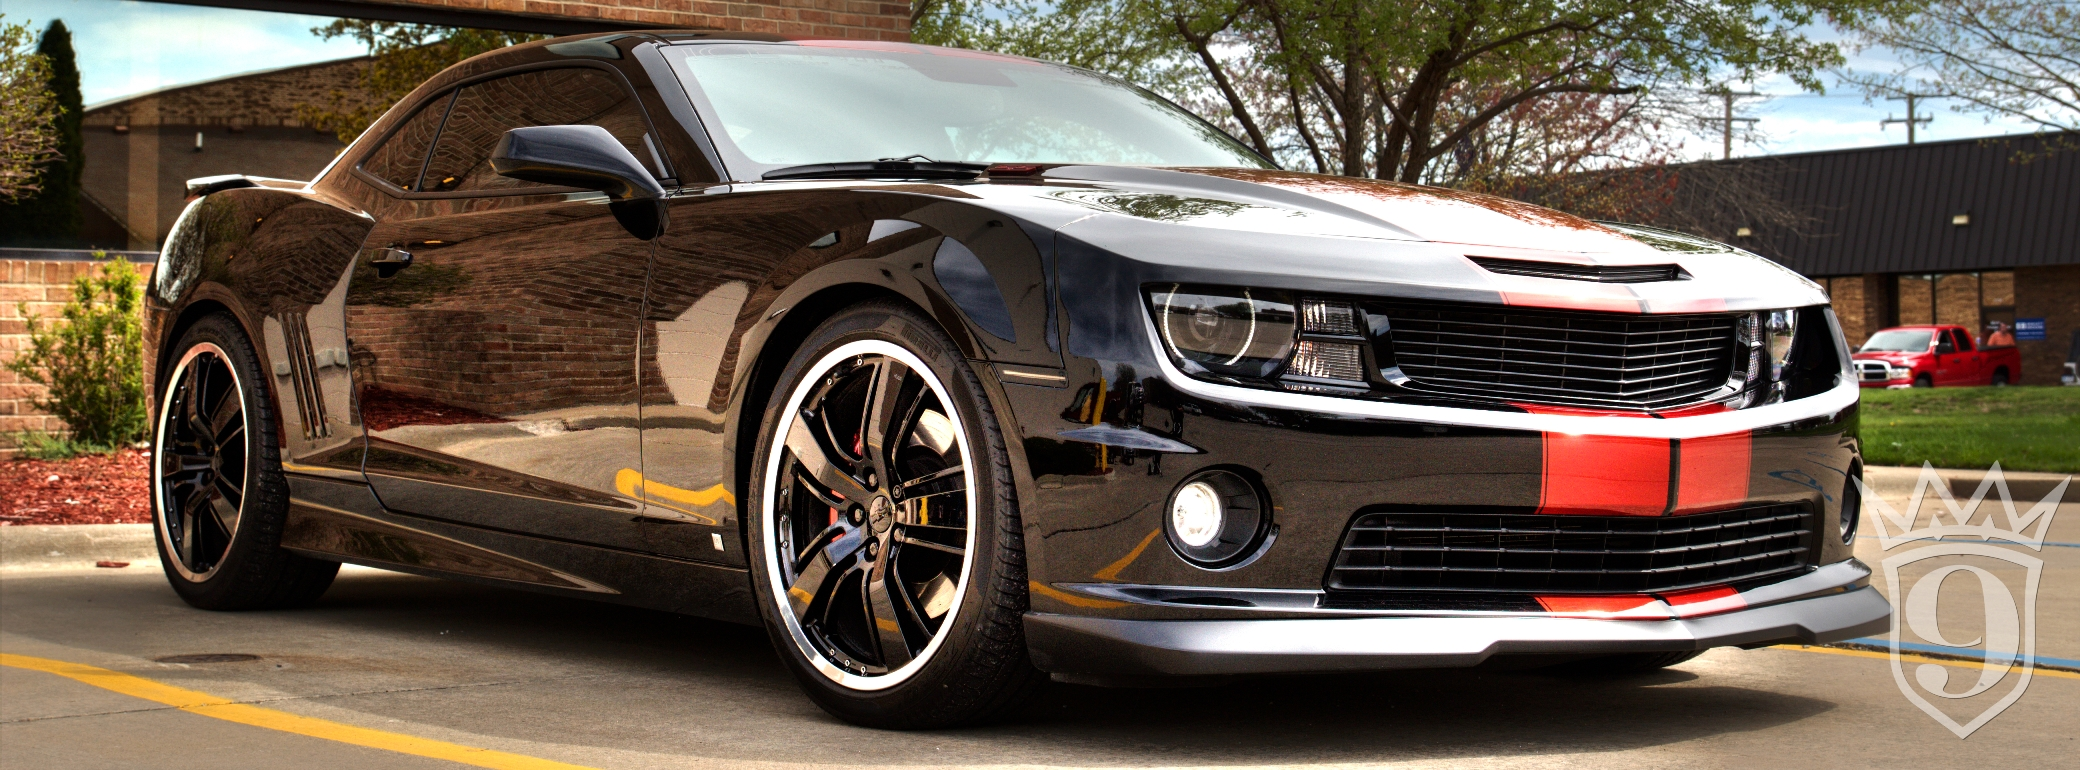 camaro wraps for sale autos post. Black Bedroom Furniture Sets. Home Design Ideas